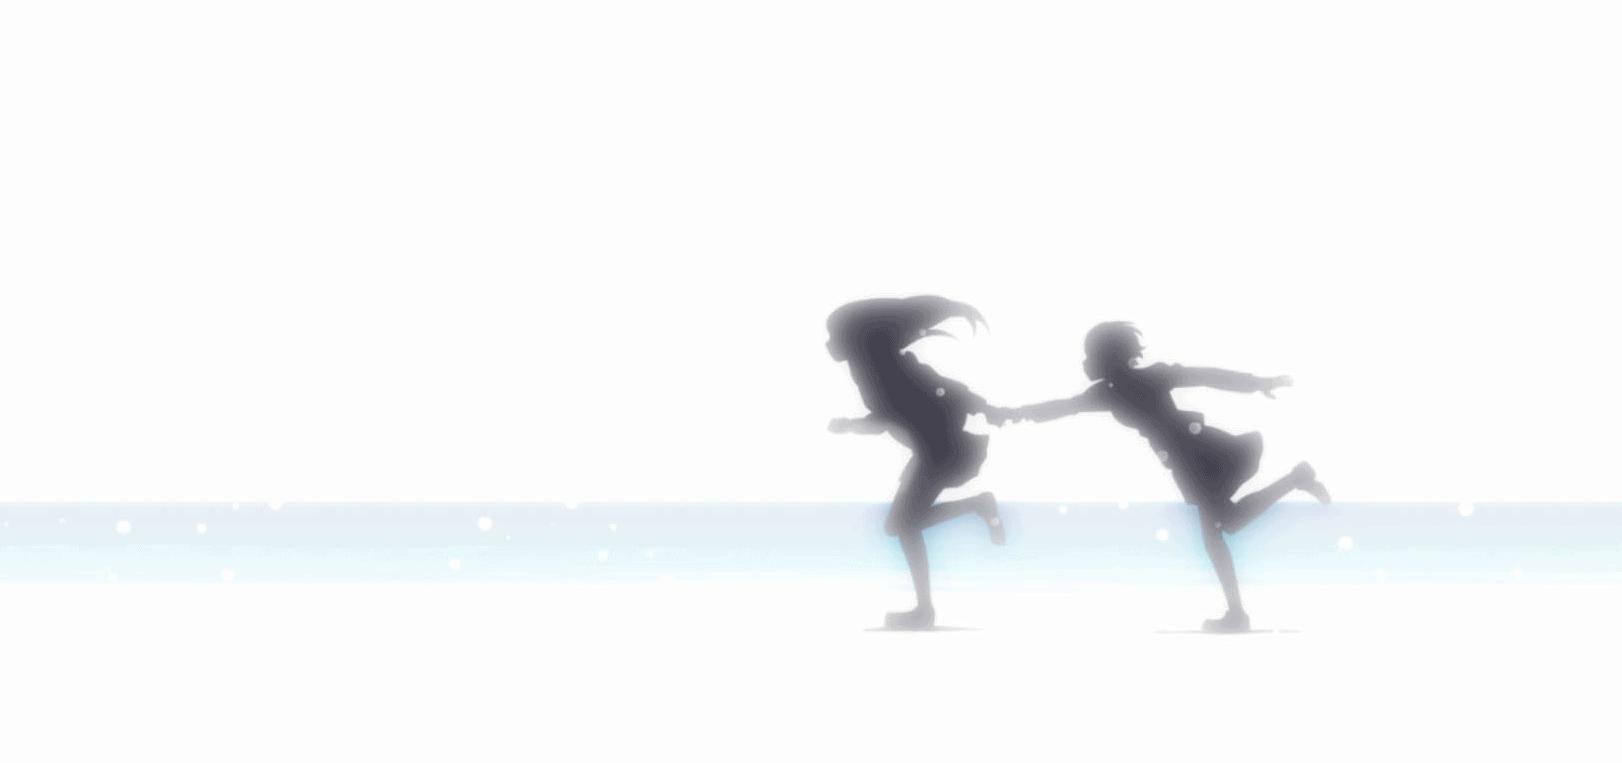 Kaze_Anime-Night_LGBTQ+_Fragtime_screenshot_8